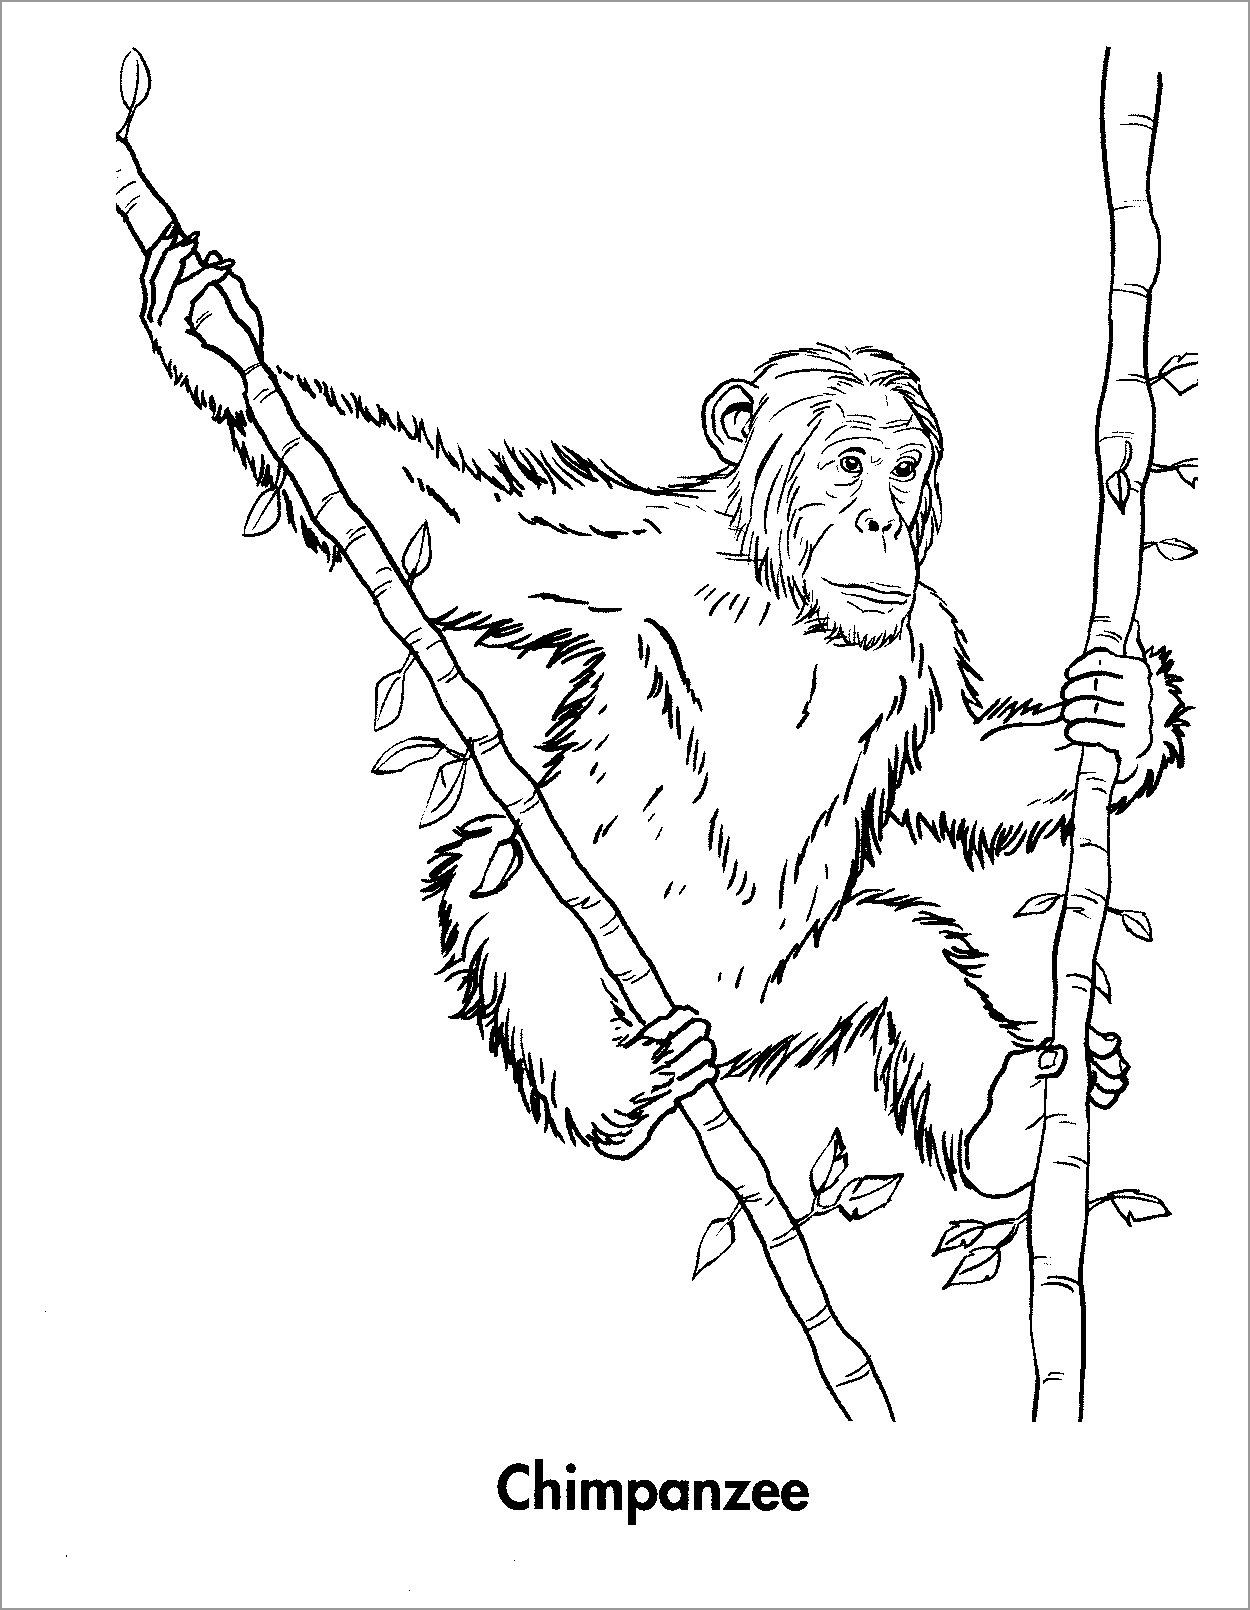 Printable Chimpanzee Coloring Page